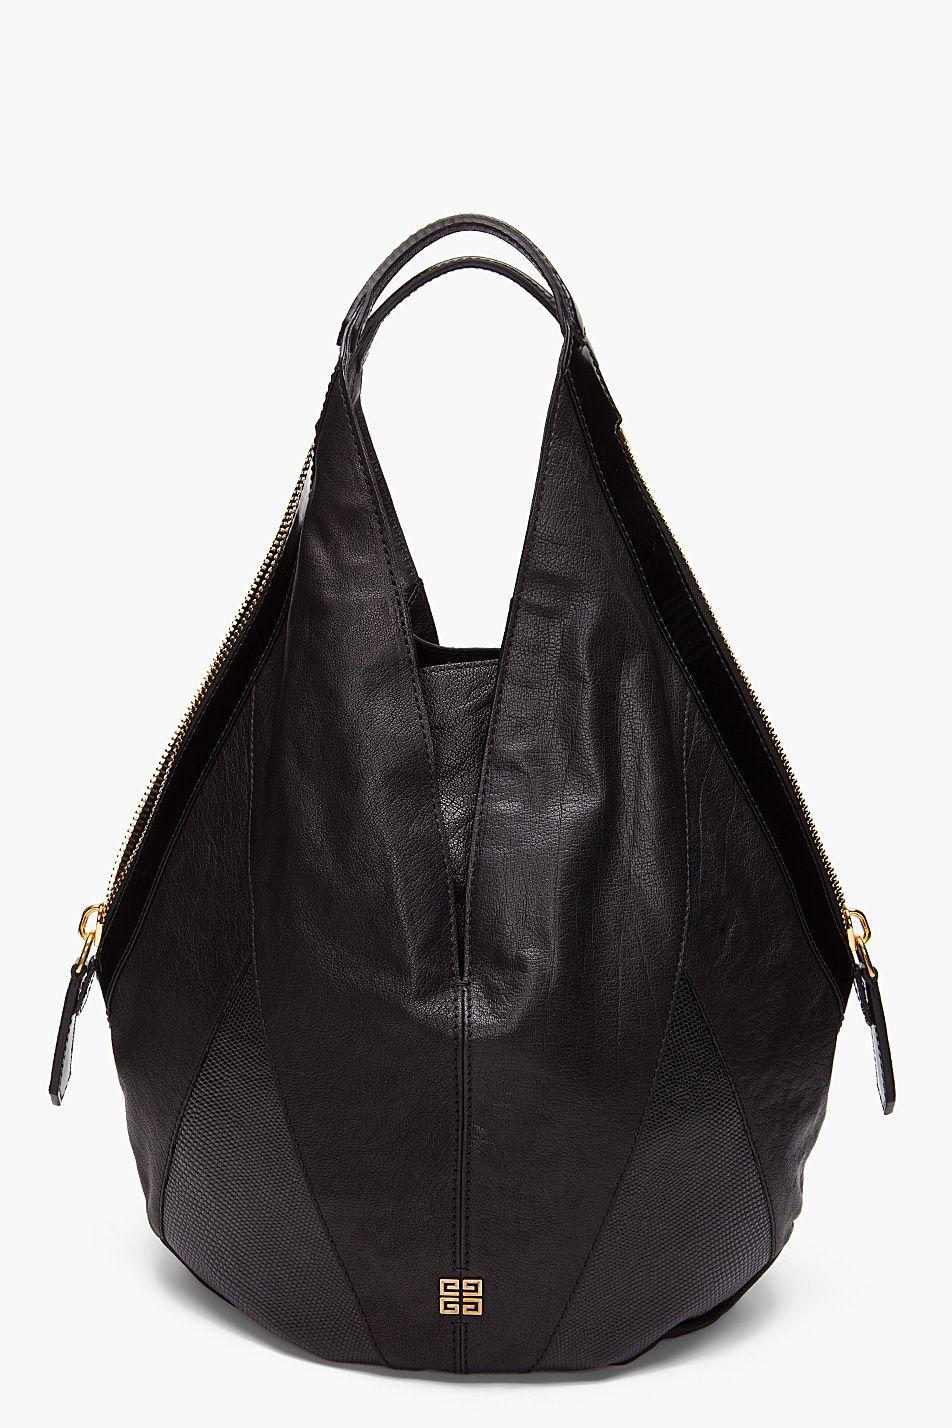 a73038790c Givenchy | my handbags | Shoes and purses. | Borse nere, Borsette, Borse